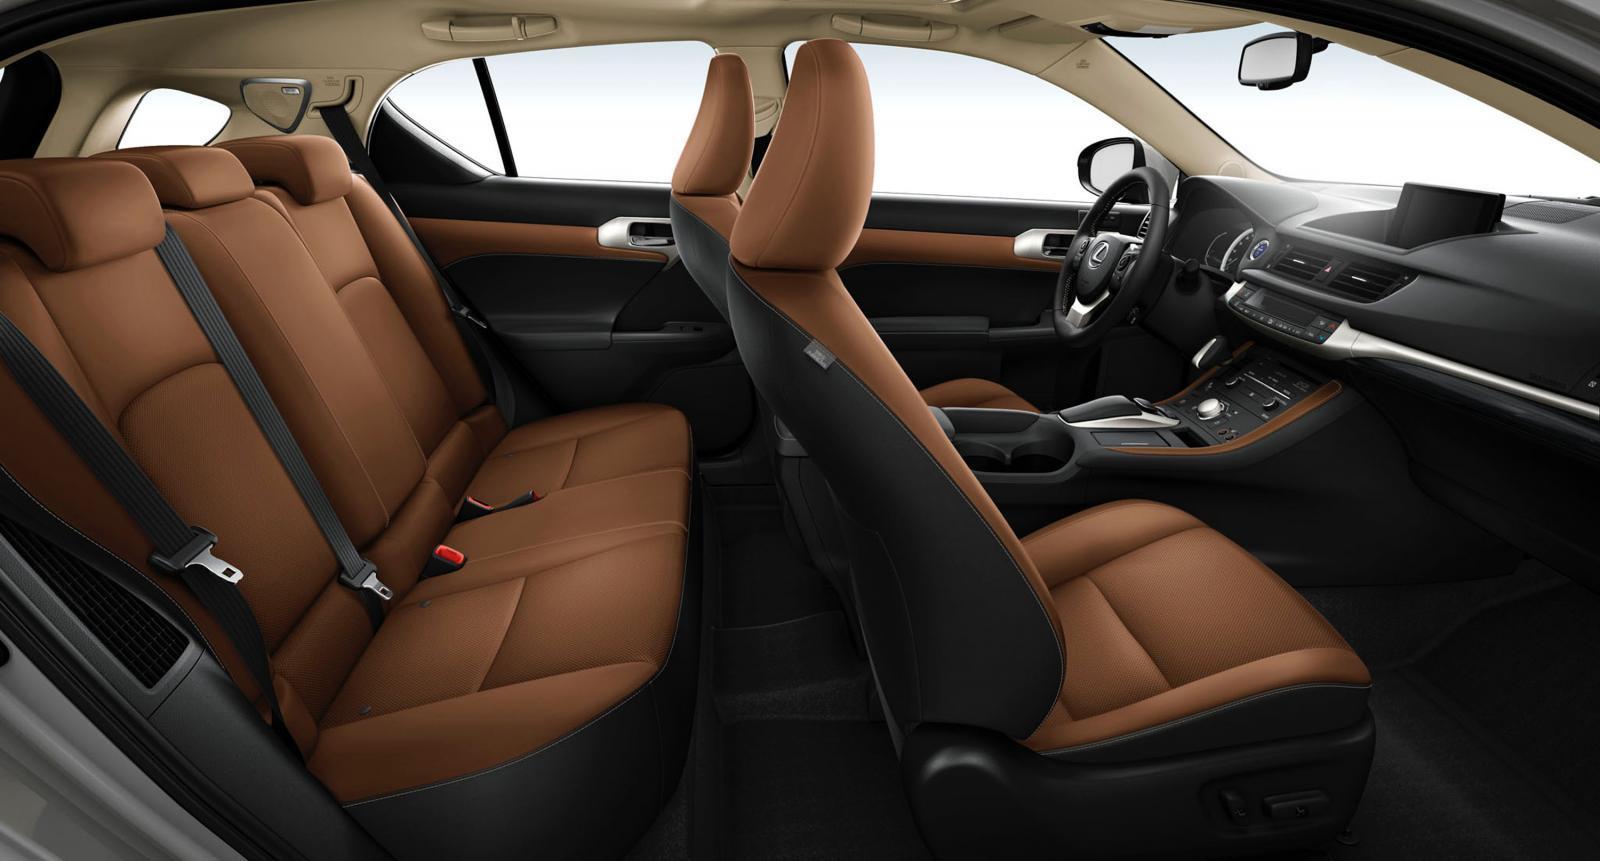 Foto de Lexus CT 200h 2014 (9/12)